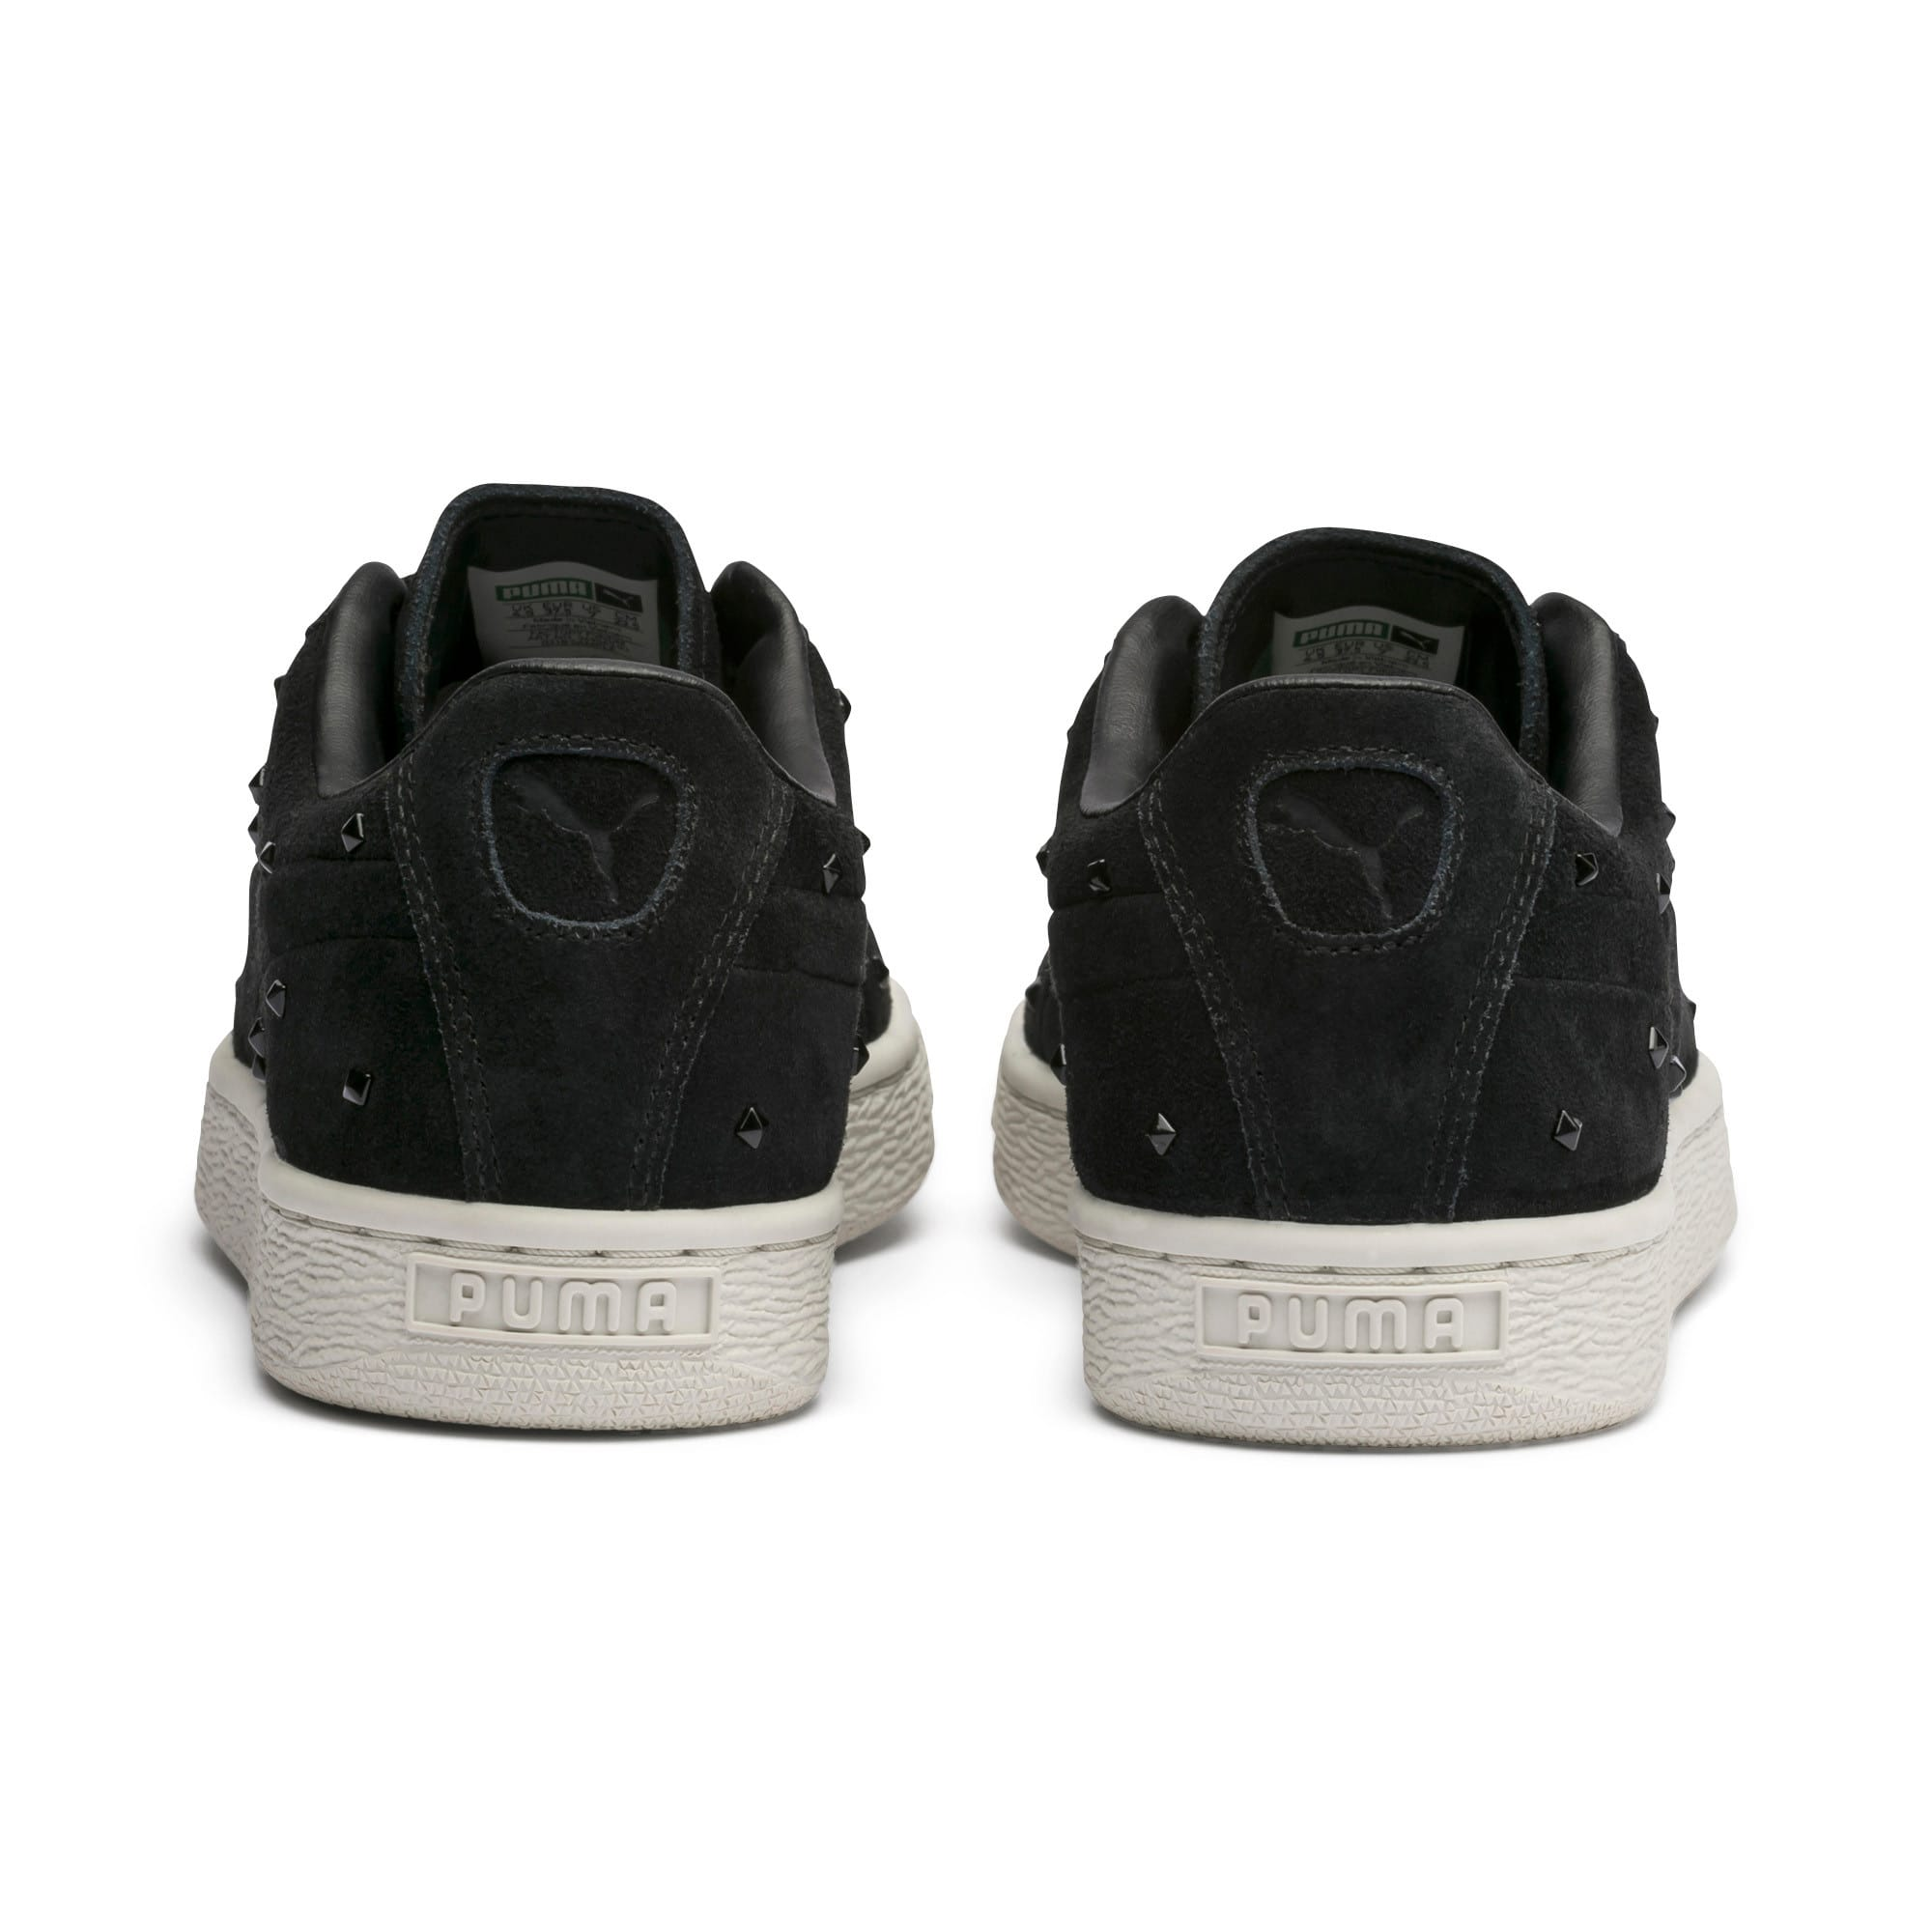 Thumbnail 4 of Suede Studs Damen Sneaker, Puma Black-Marshmallow, medium